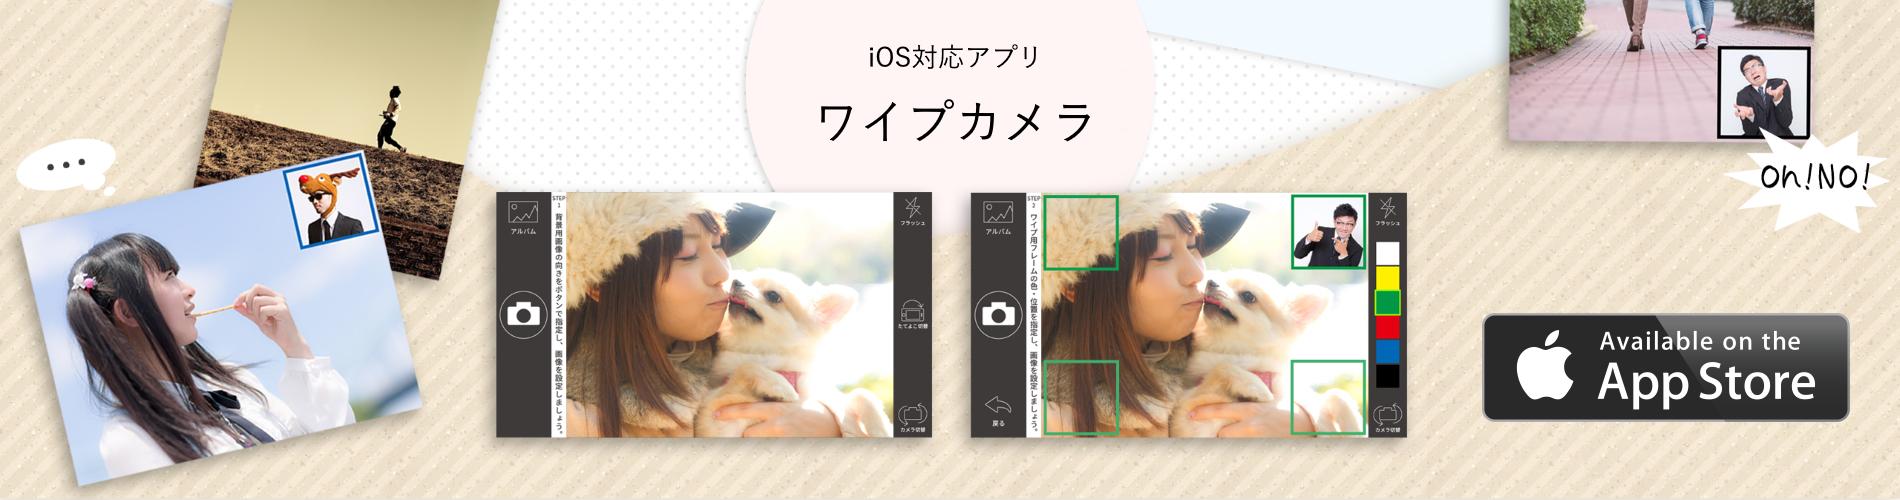 iOS対応アプリ「ワイプカメラ」